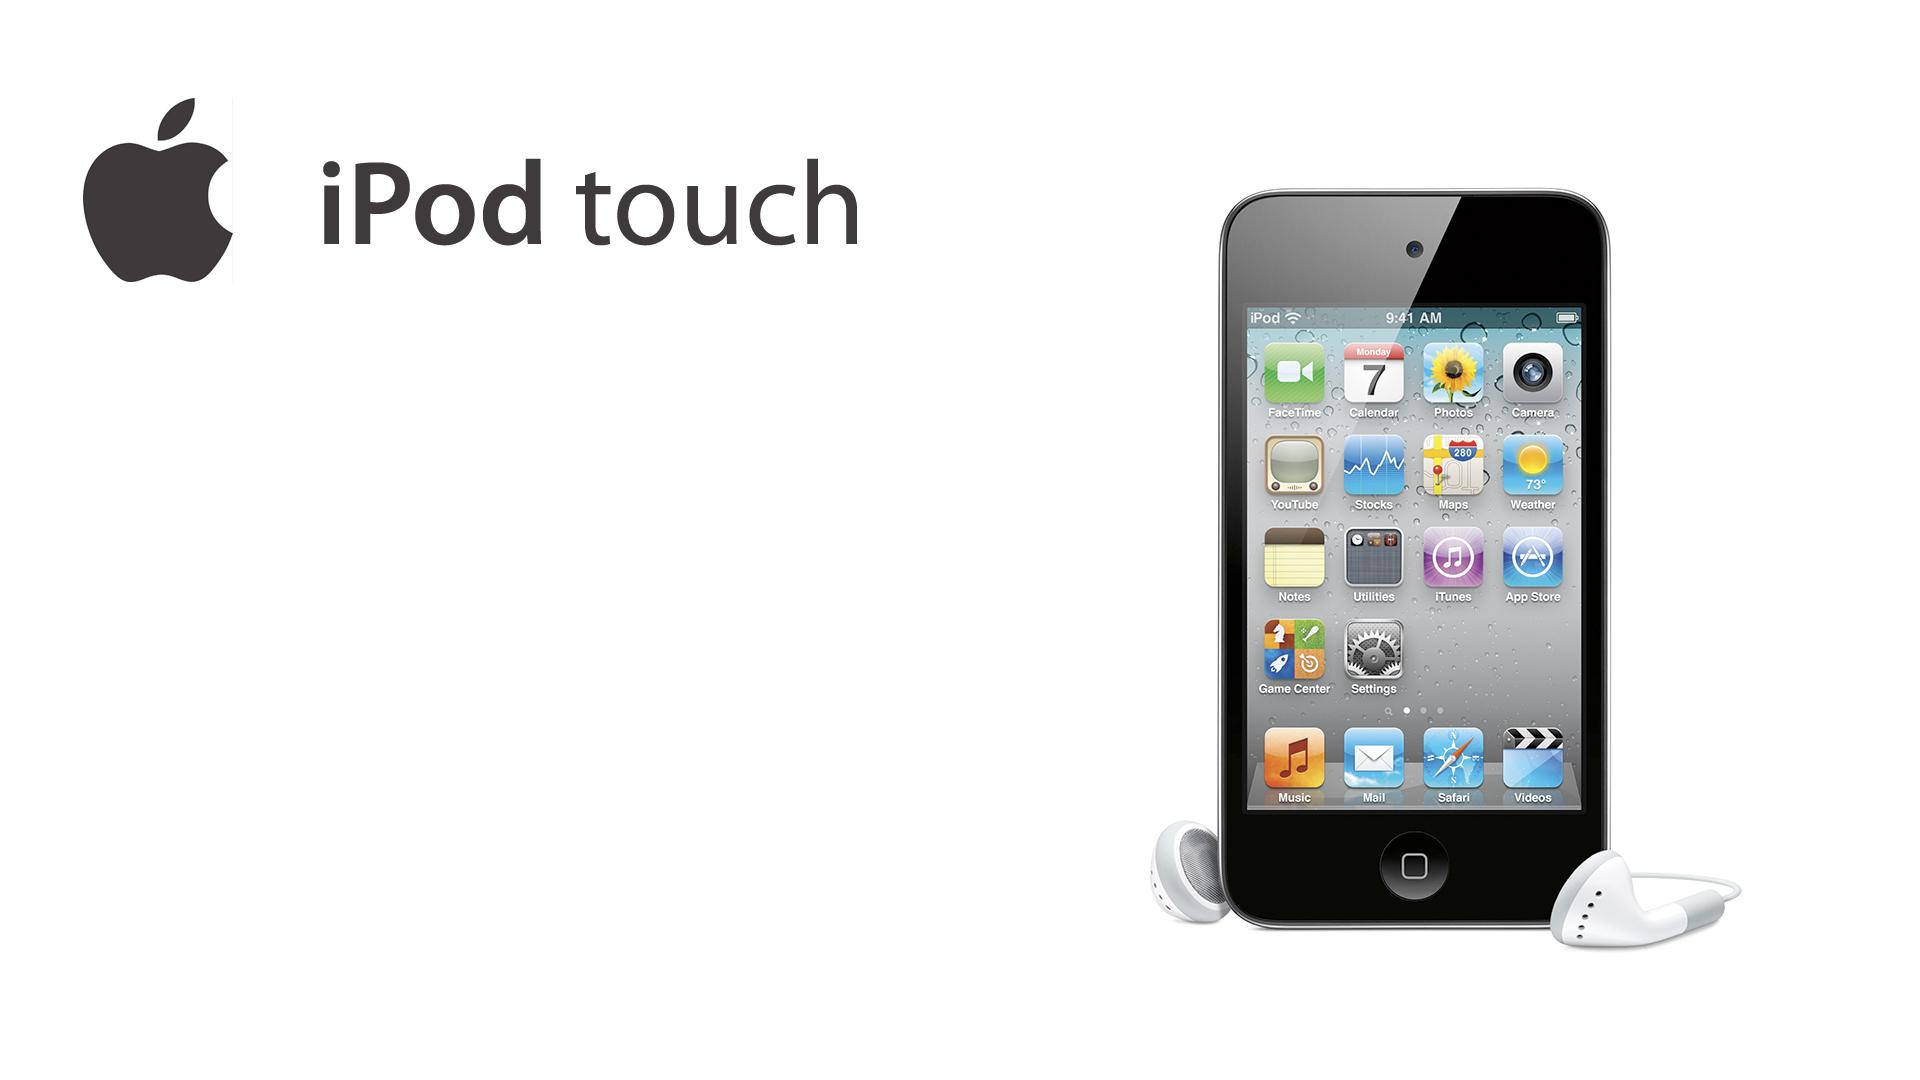 wallpaper ipod touch by ra1lander on deviantart